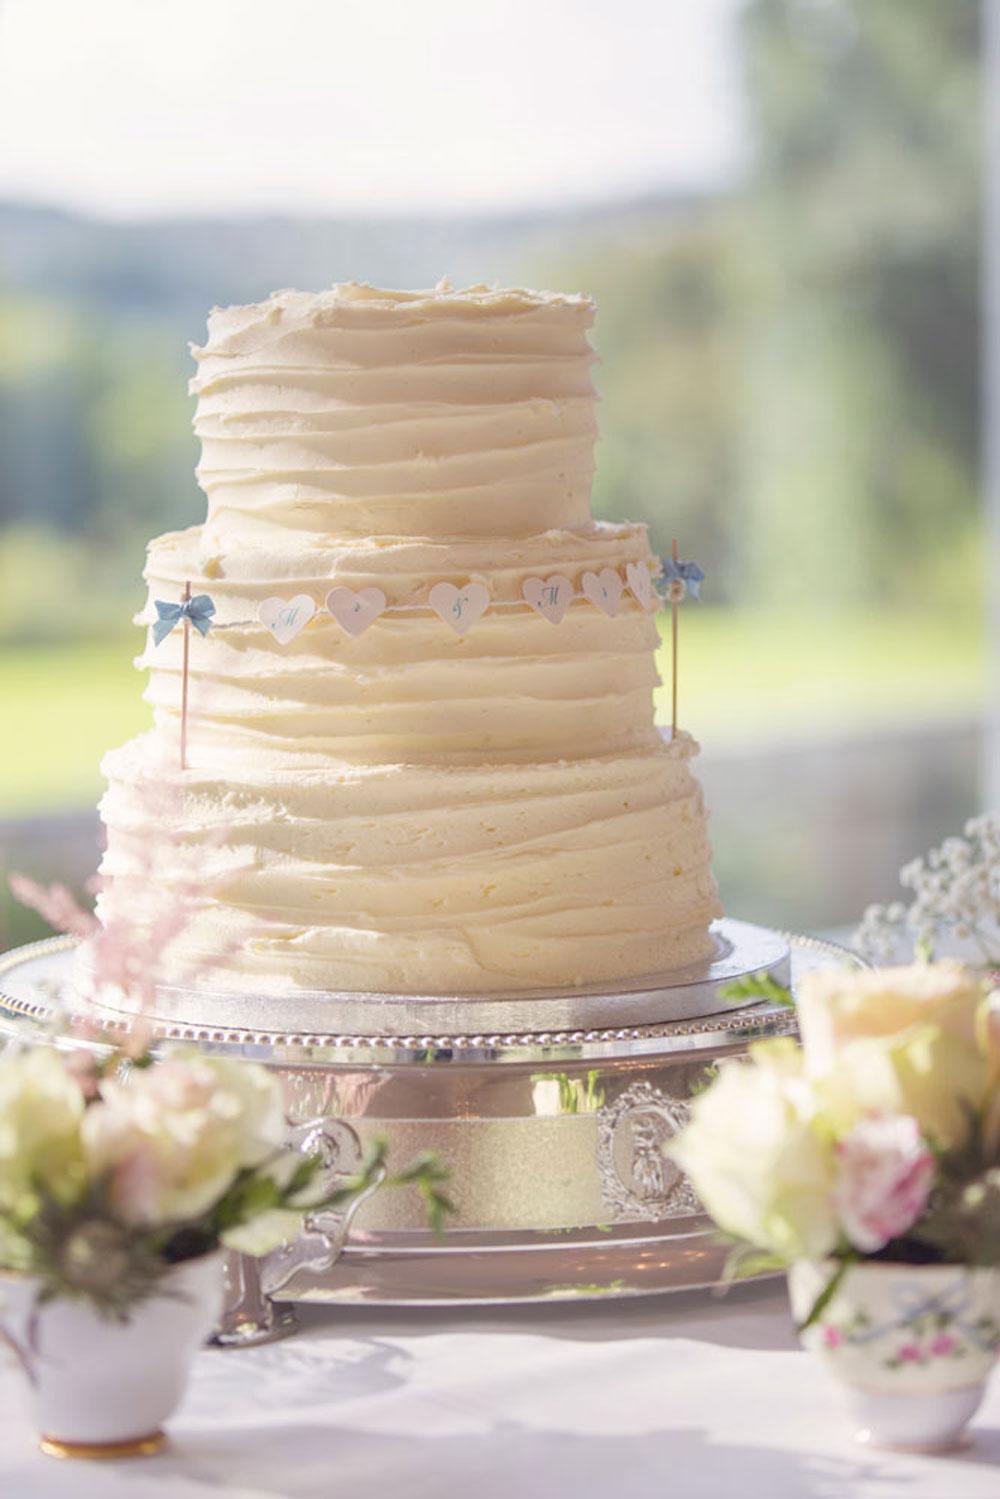 Ardoe House Hotel wedding, wedding cake, Anna Wytrazek Photography, wedding photographer Aberdeen